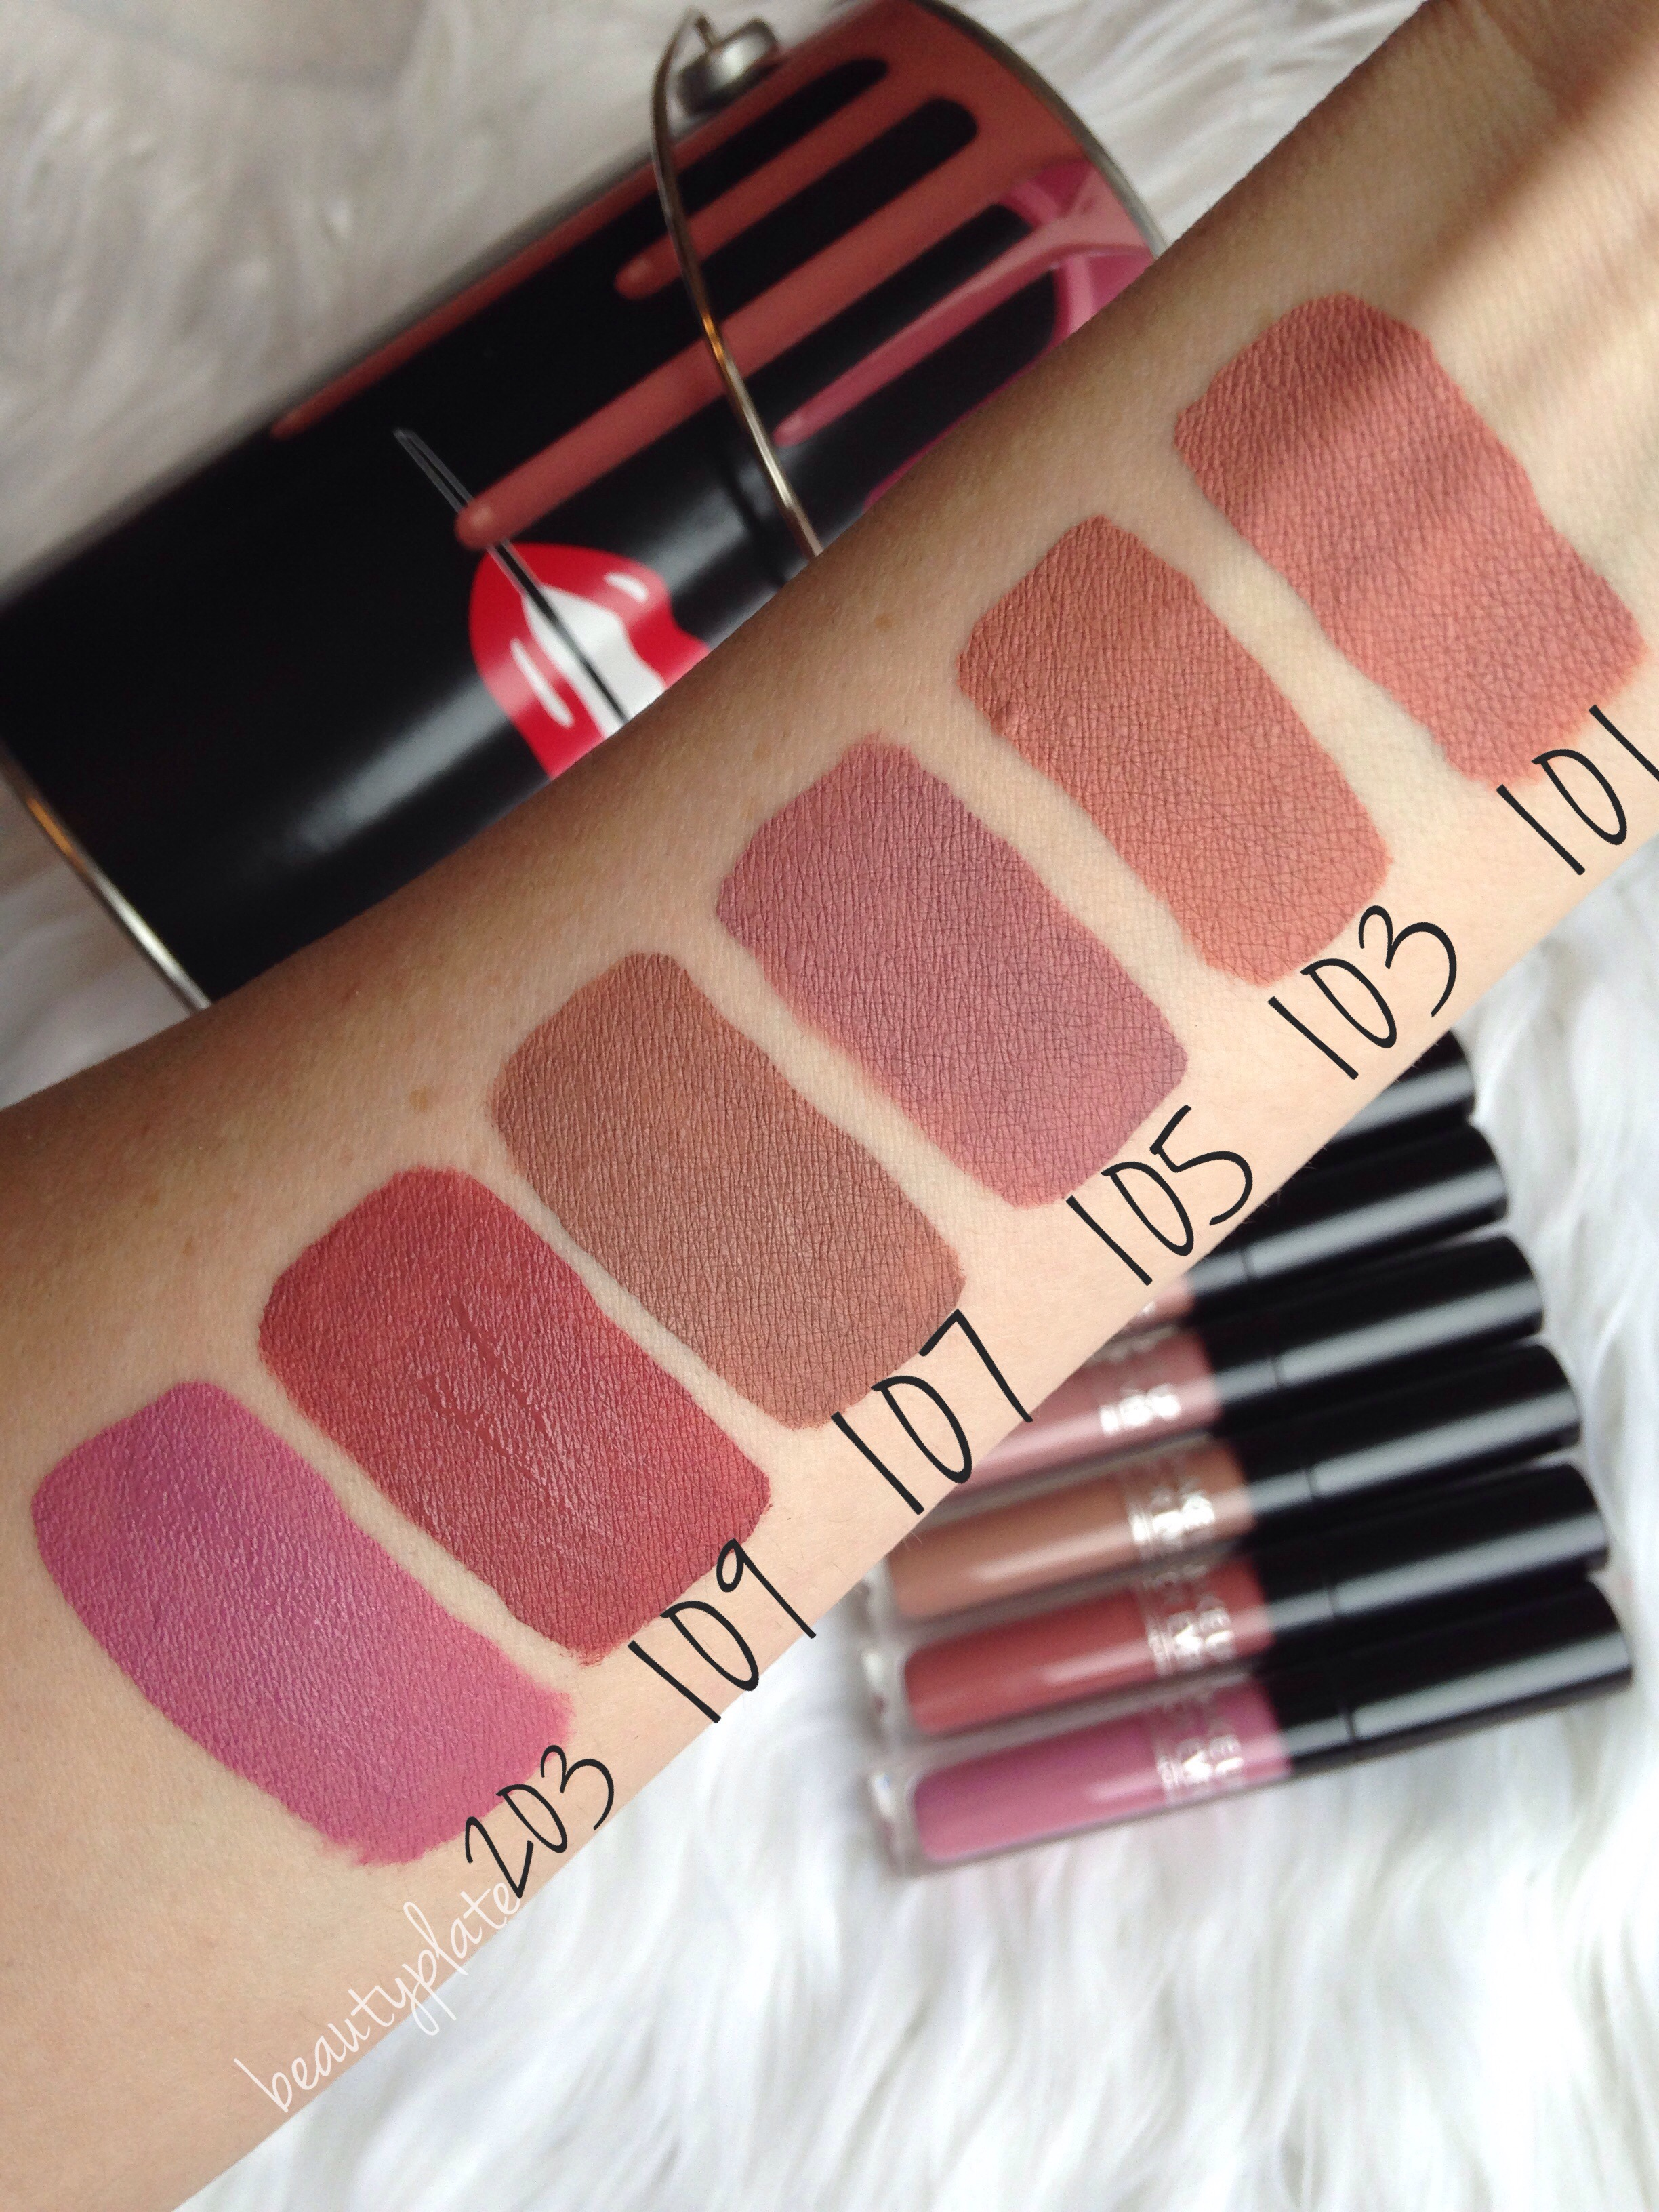 Artist Liquid Matte Lipstick by Make Up For Ever #12